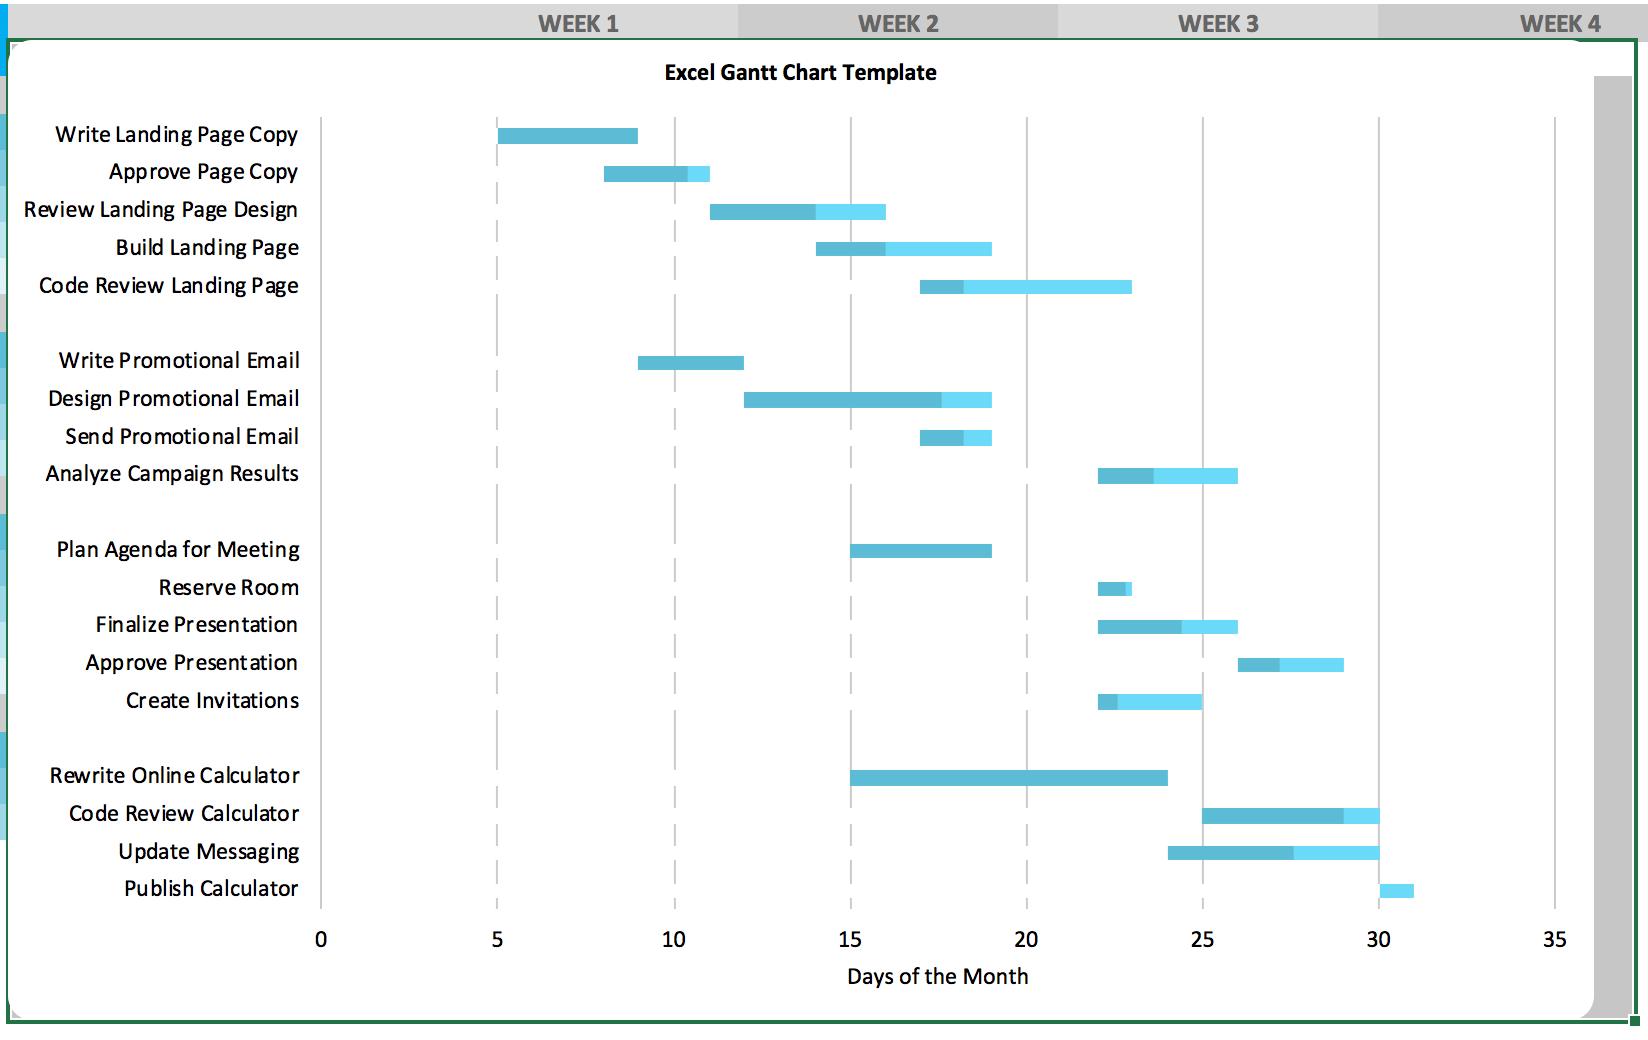 Free Gantt Chart Excel Template: Download Now | Teamgantt throughout Excel Spreadsheet Gantt Chart Template